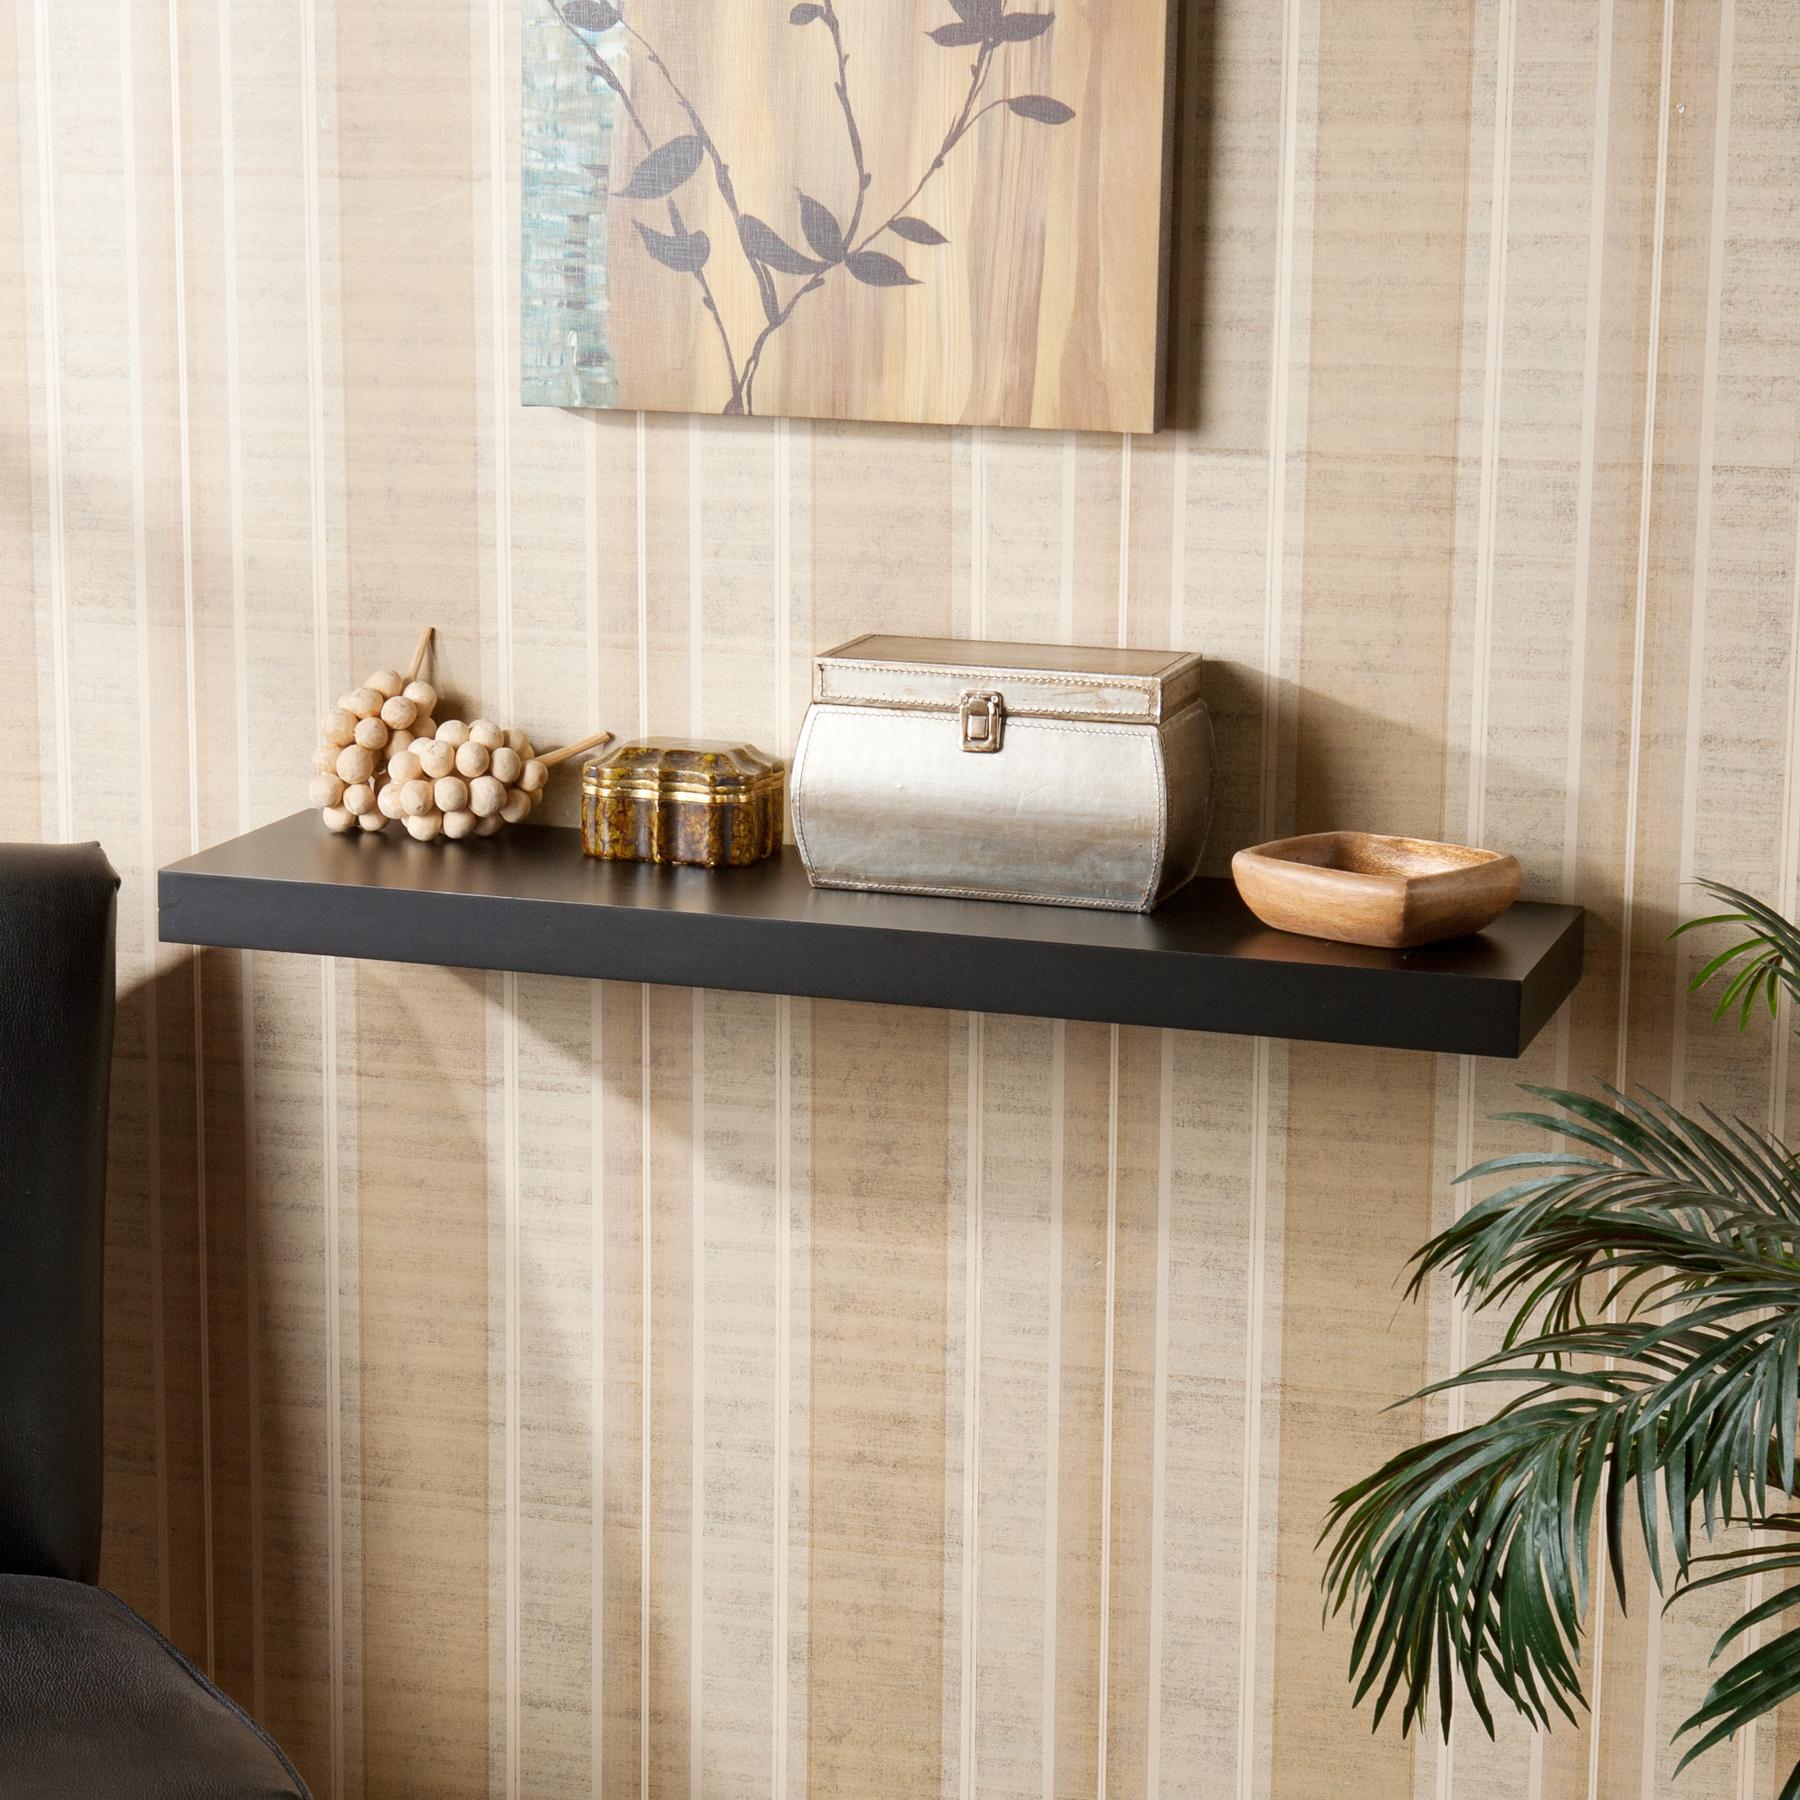 Chicago Floating Shelf 36 – Black Regarding Modern Mobile Rolling Tv Stands With Metal Shelf Black Finish (View 16 of 20)